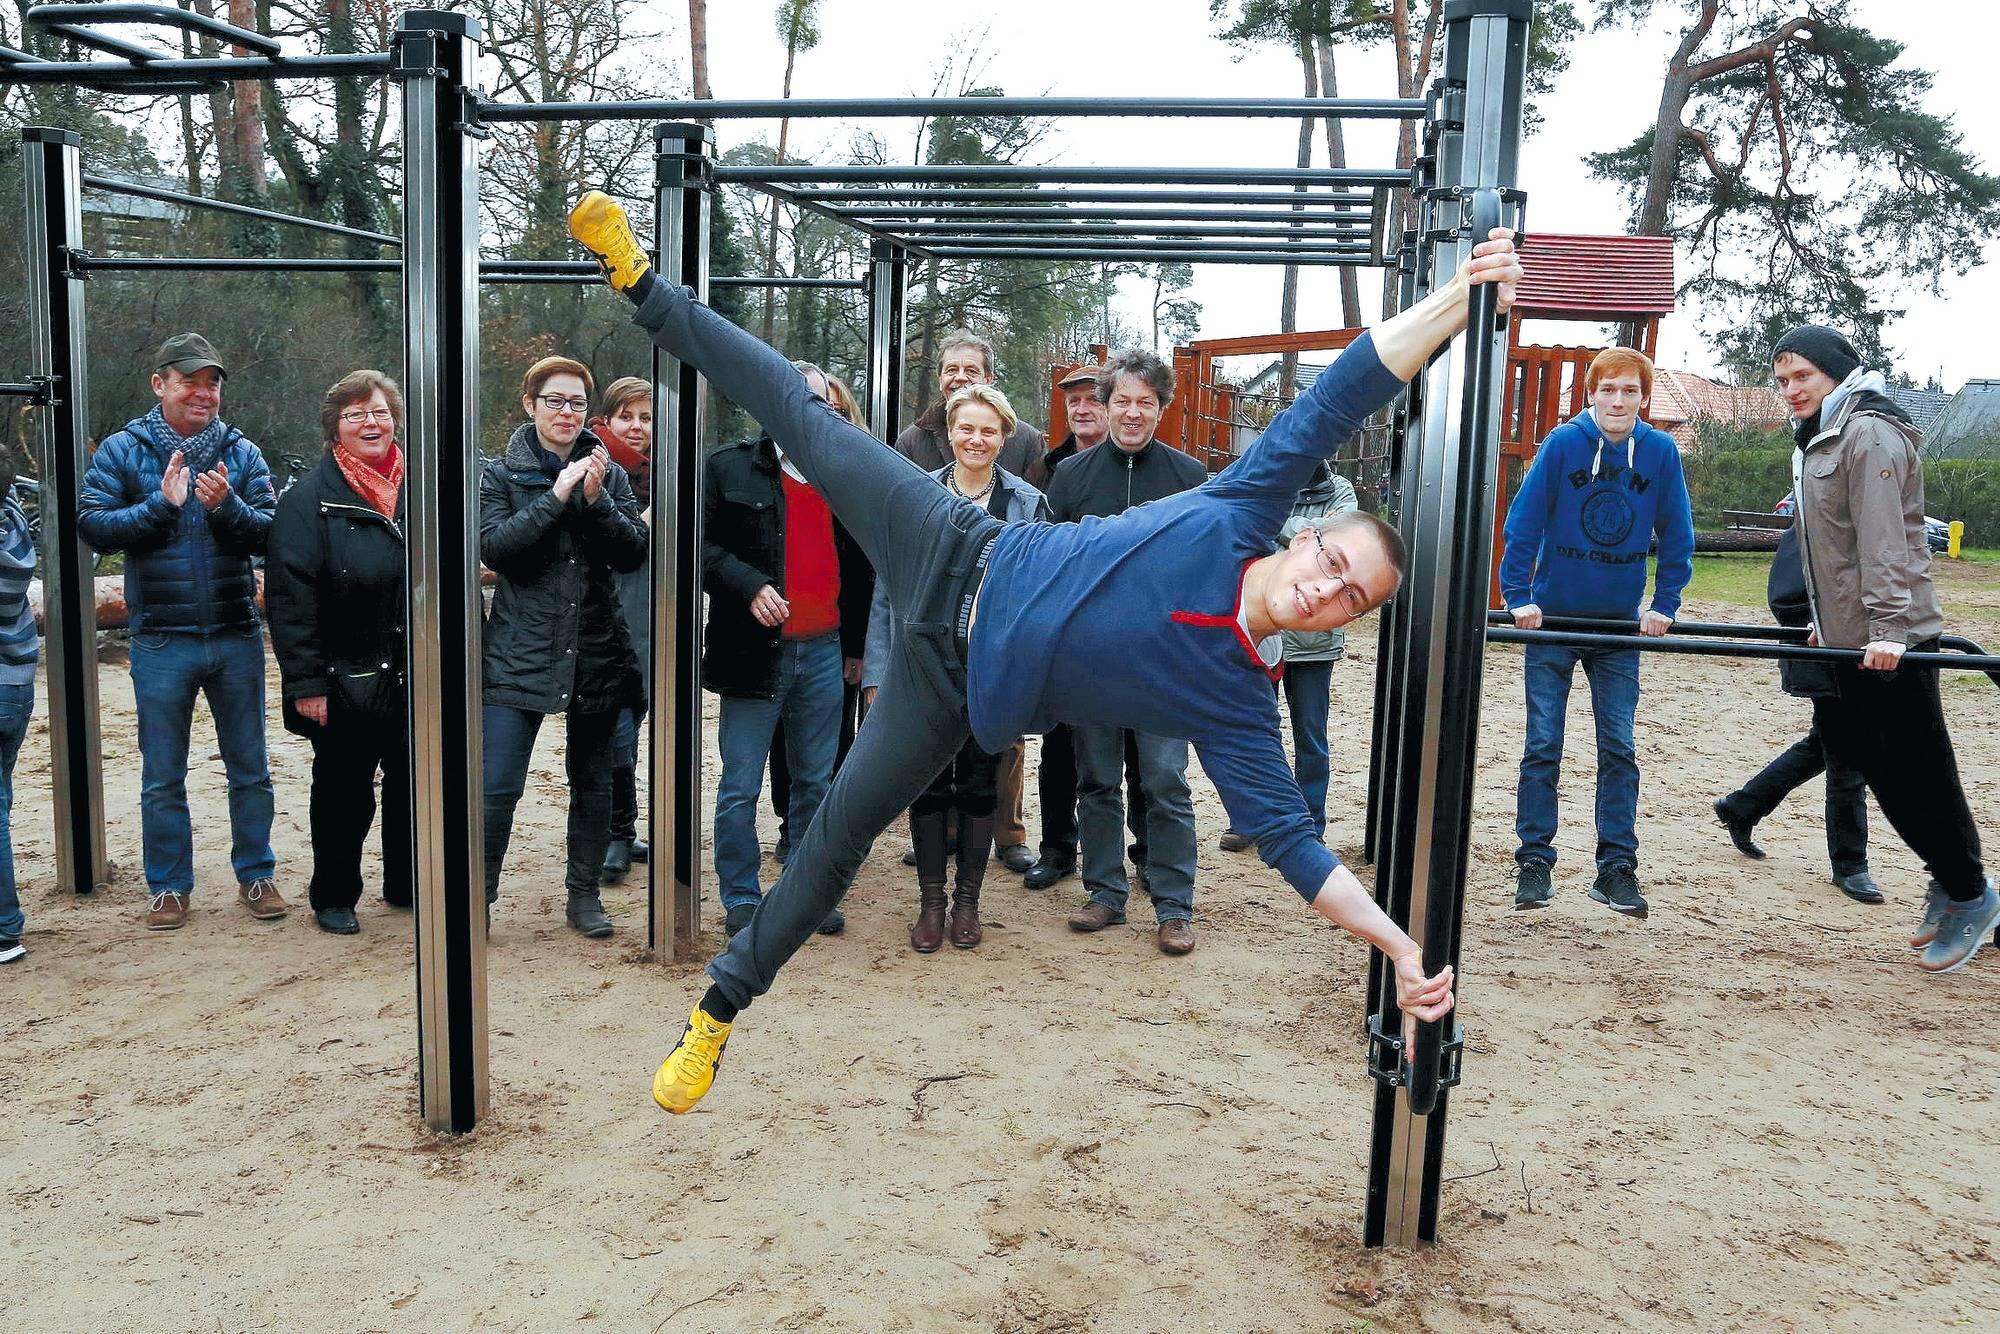 Klettergerüst Calisthenics : Calisthenics workout u sportliches abhängen german s